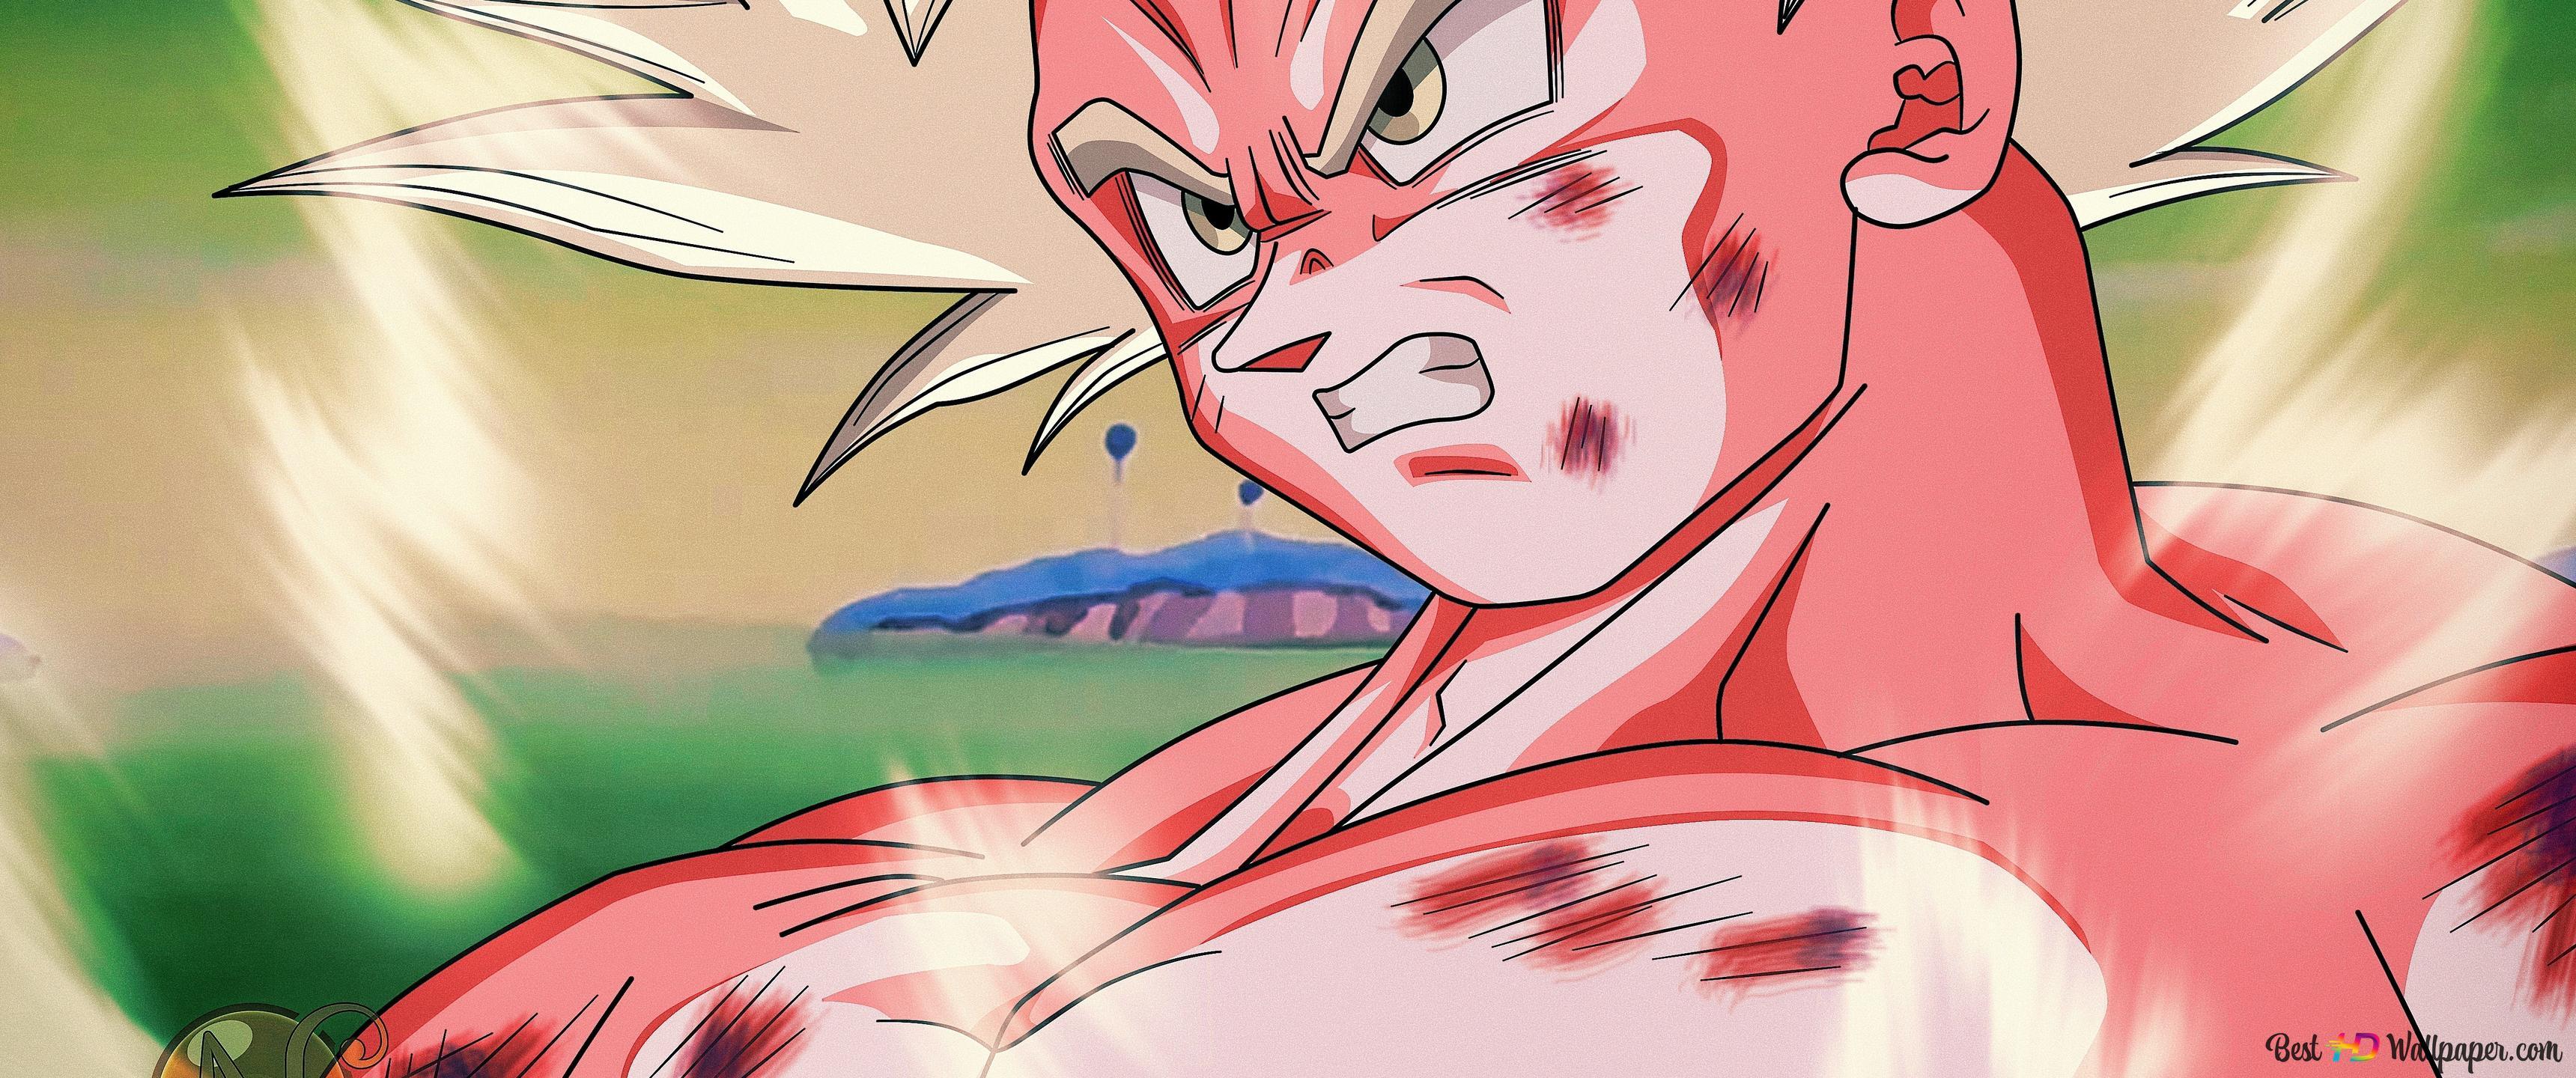 Goku Mastered Ultra Instinct Dragon Ball Z Style Hd Wallpaper Download